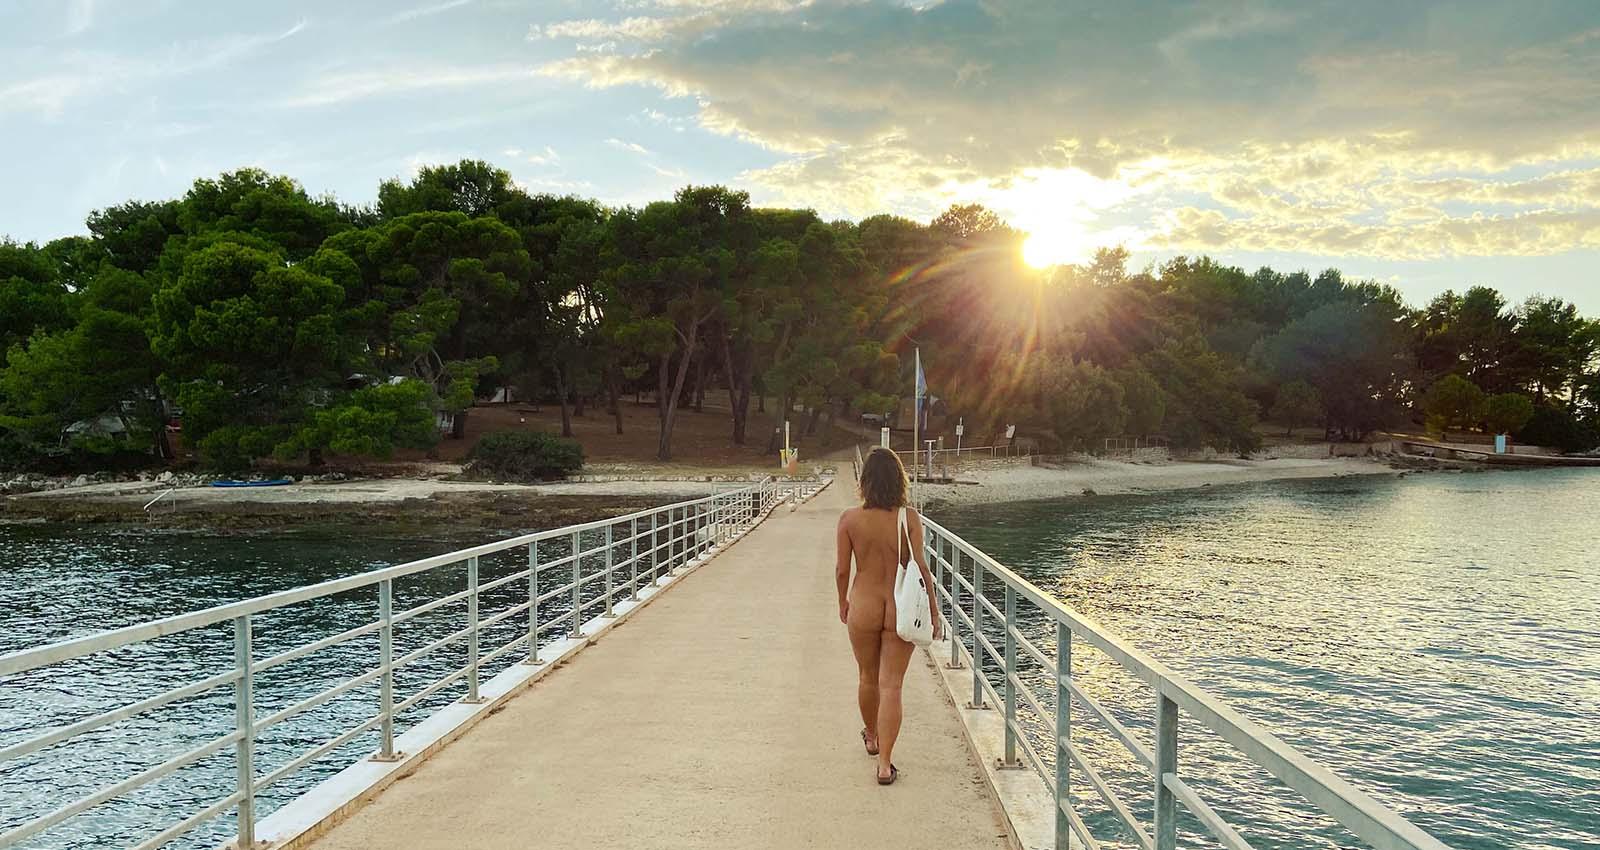 Review: Koversada Naturist Park in Istria, Croatia